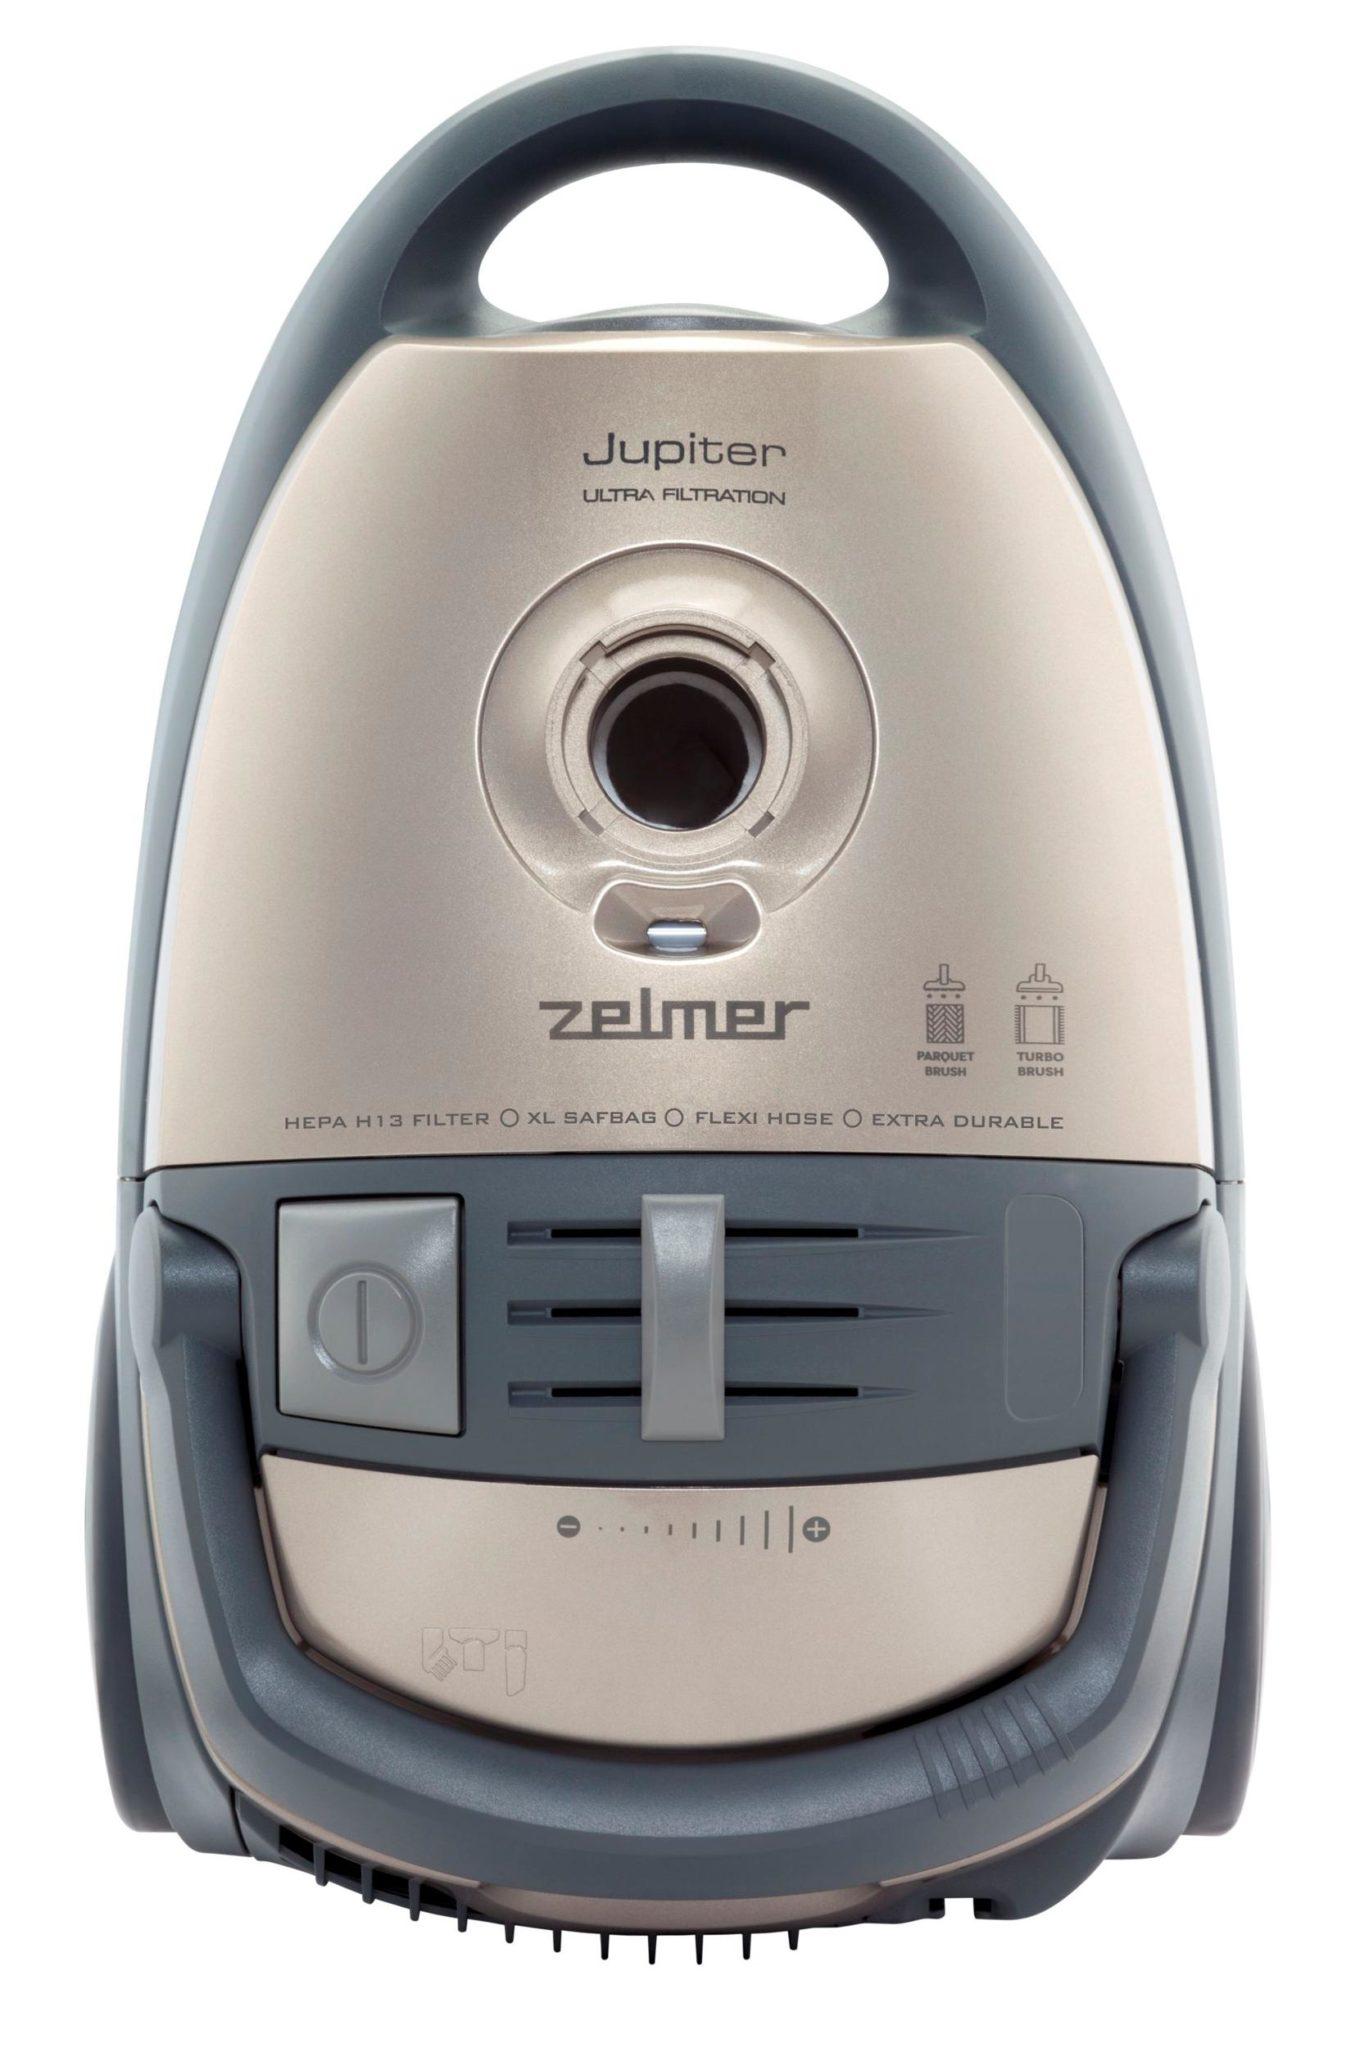 Zelmer Jupiter ZVC425HT